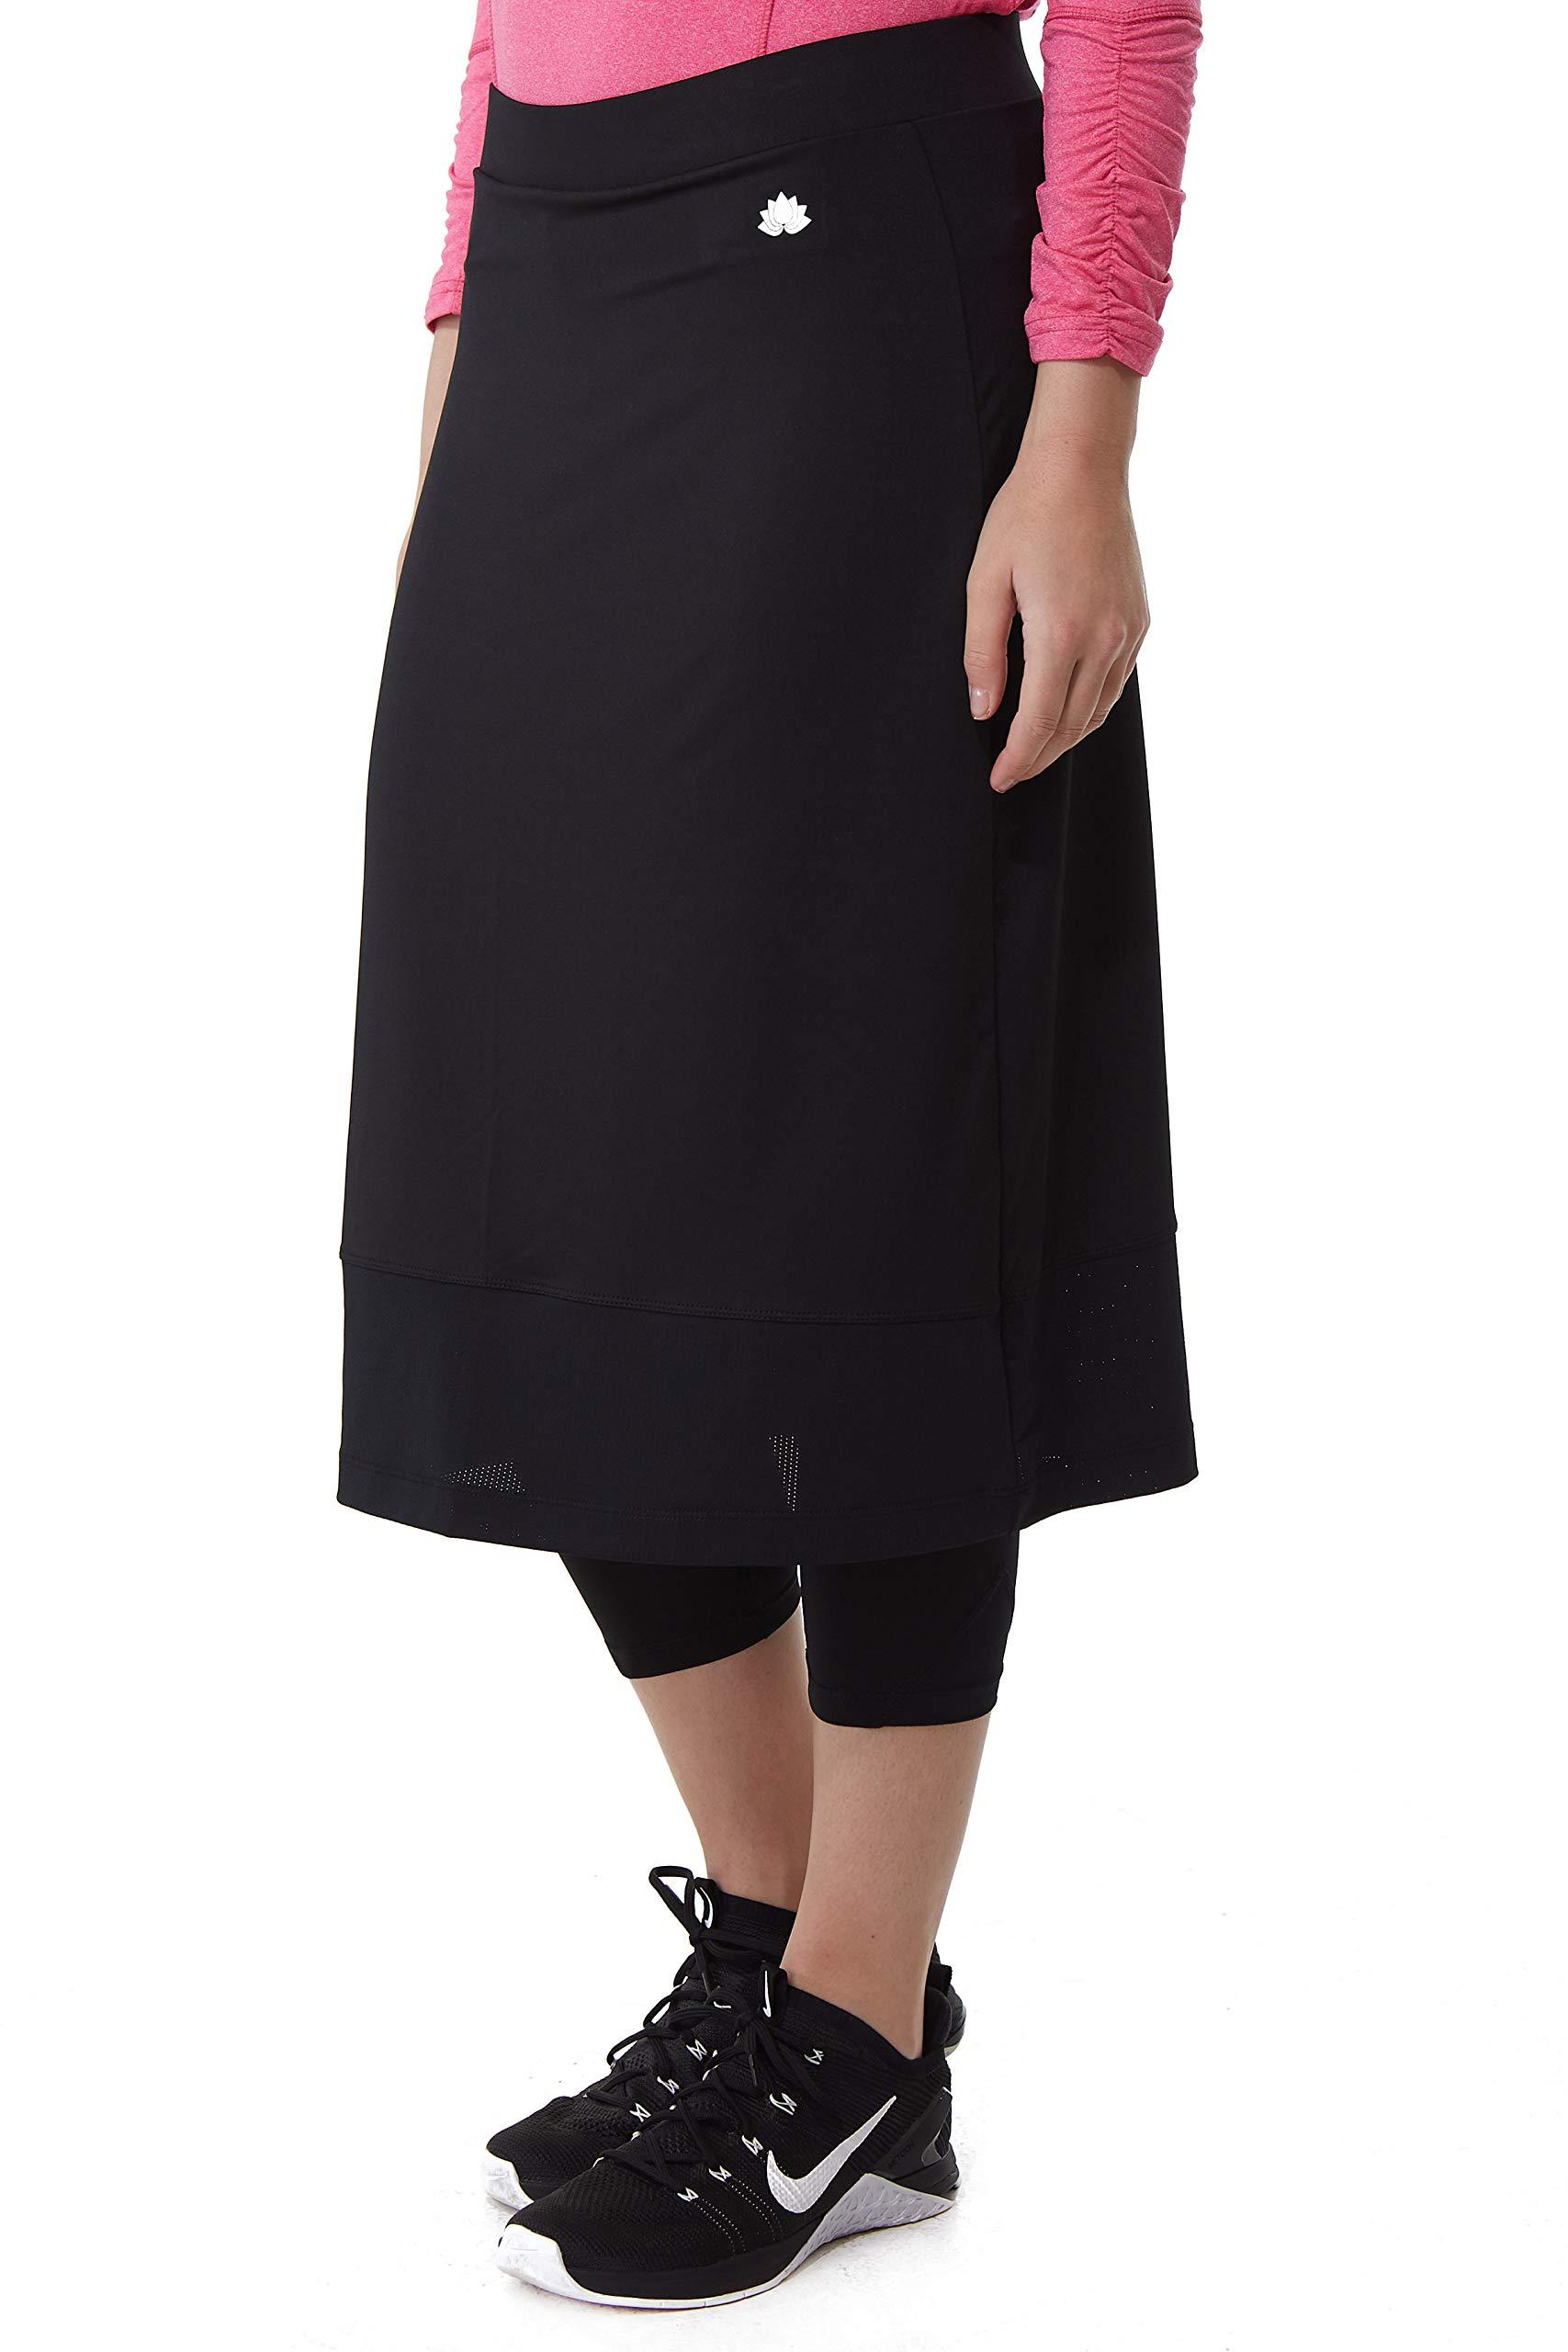 Snoga Athletics Midi Mesh Basic Workout Skirt with Leggings - Black, 1X